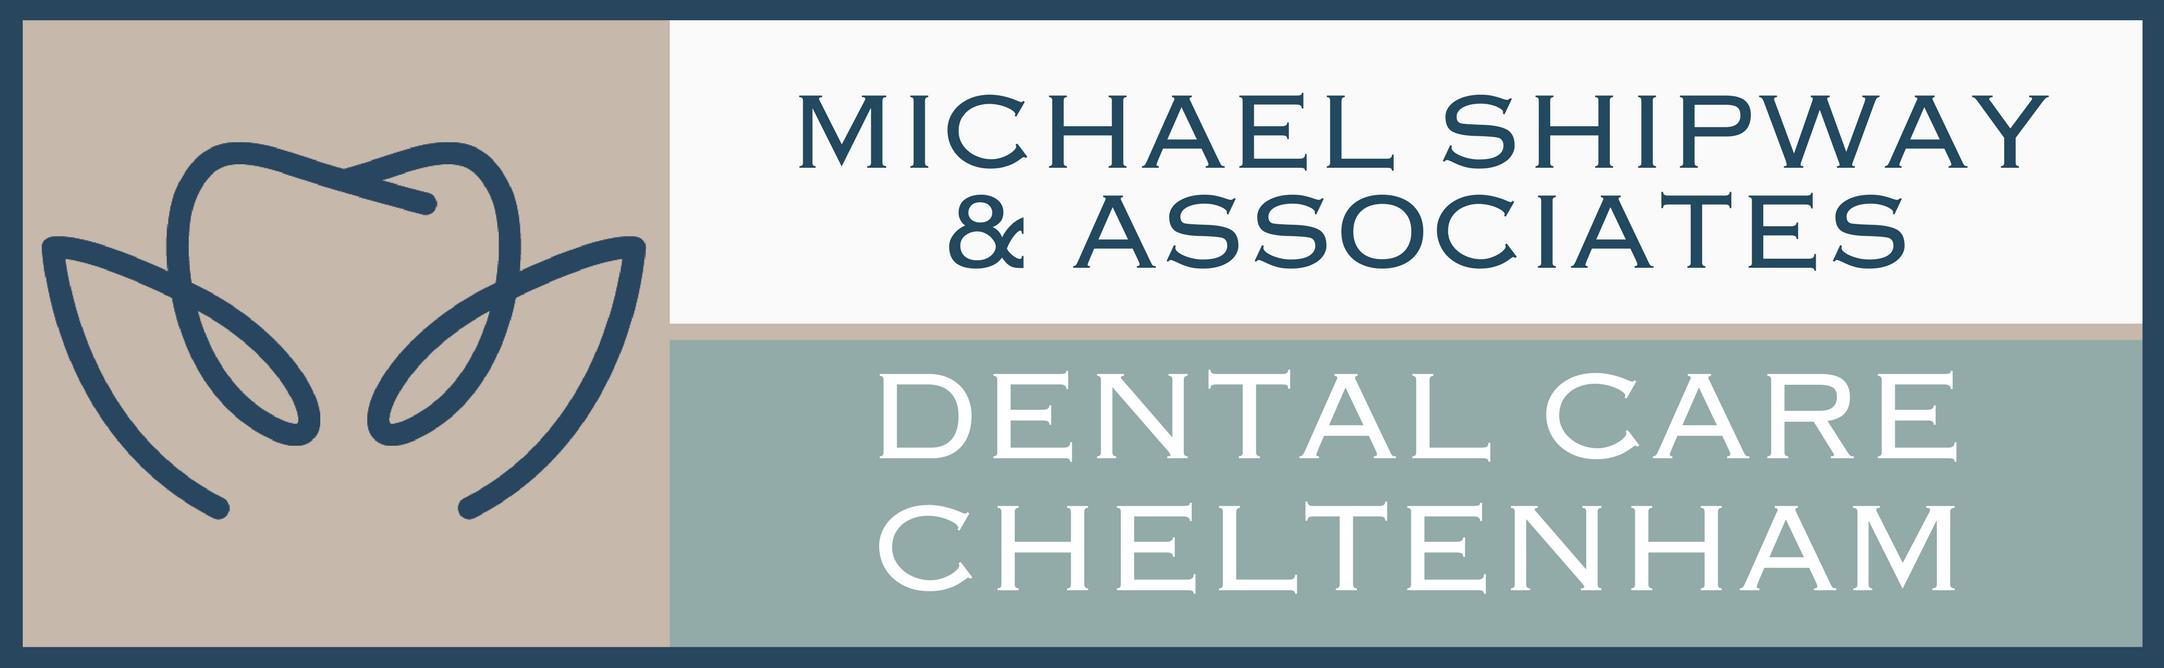 Michael Shipway & Associates